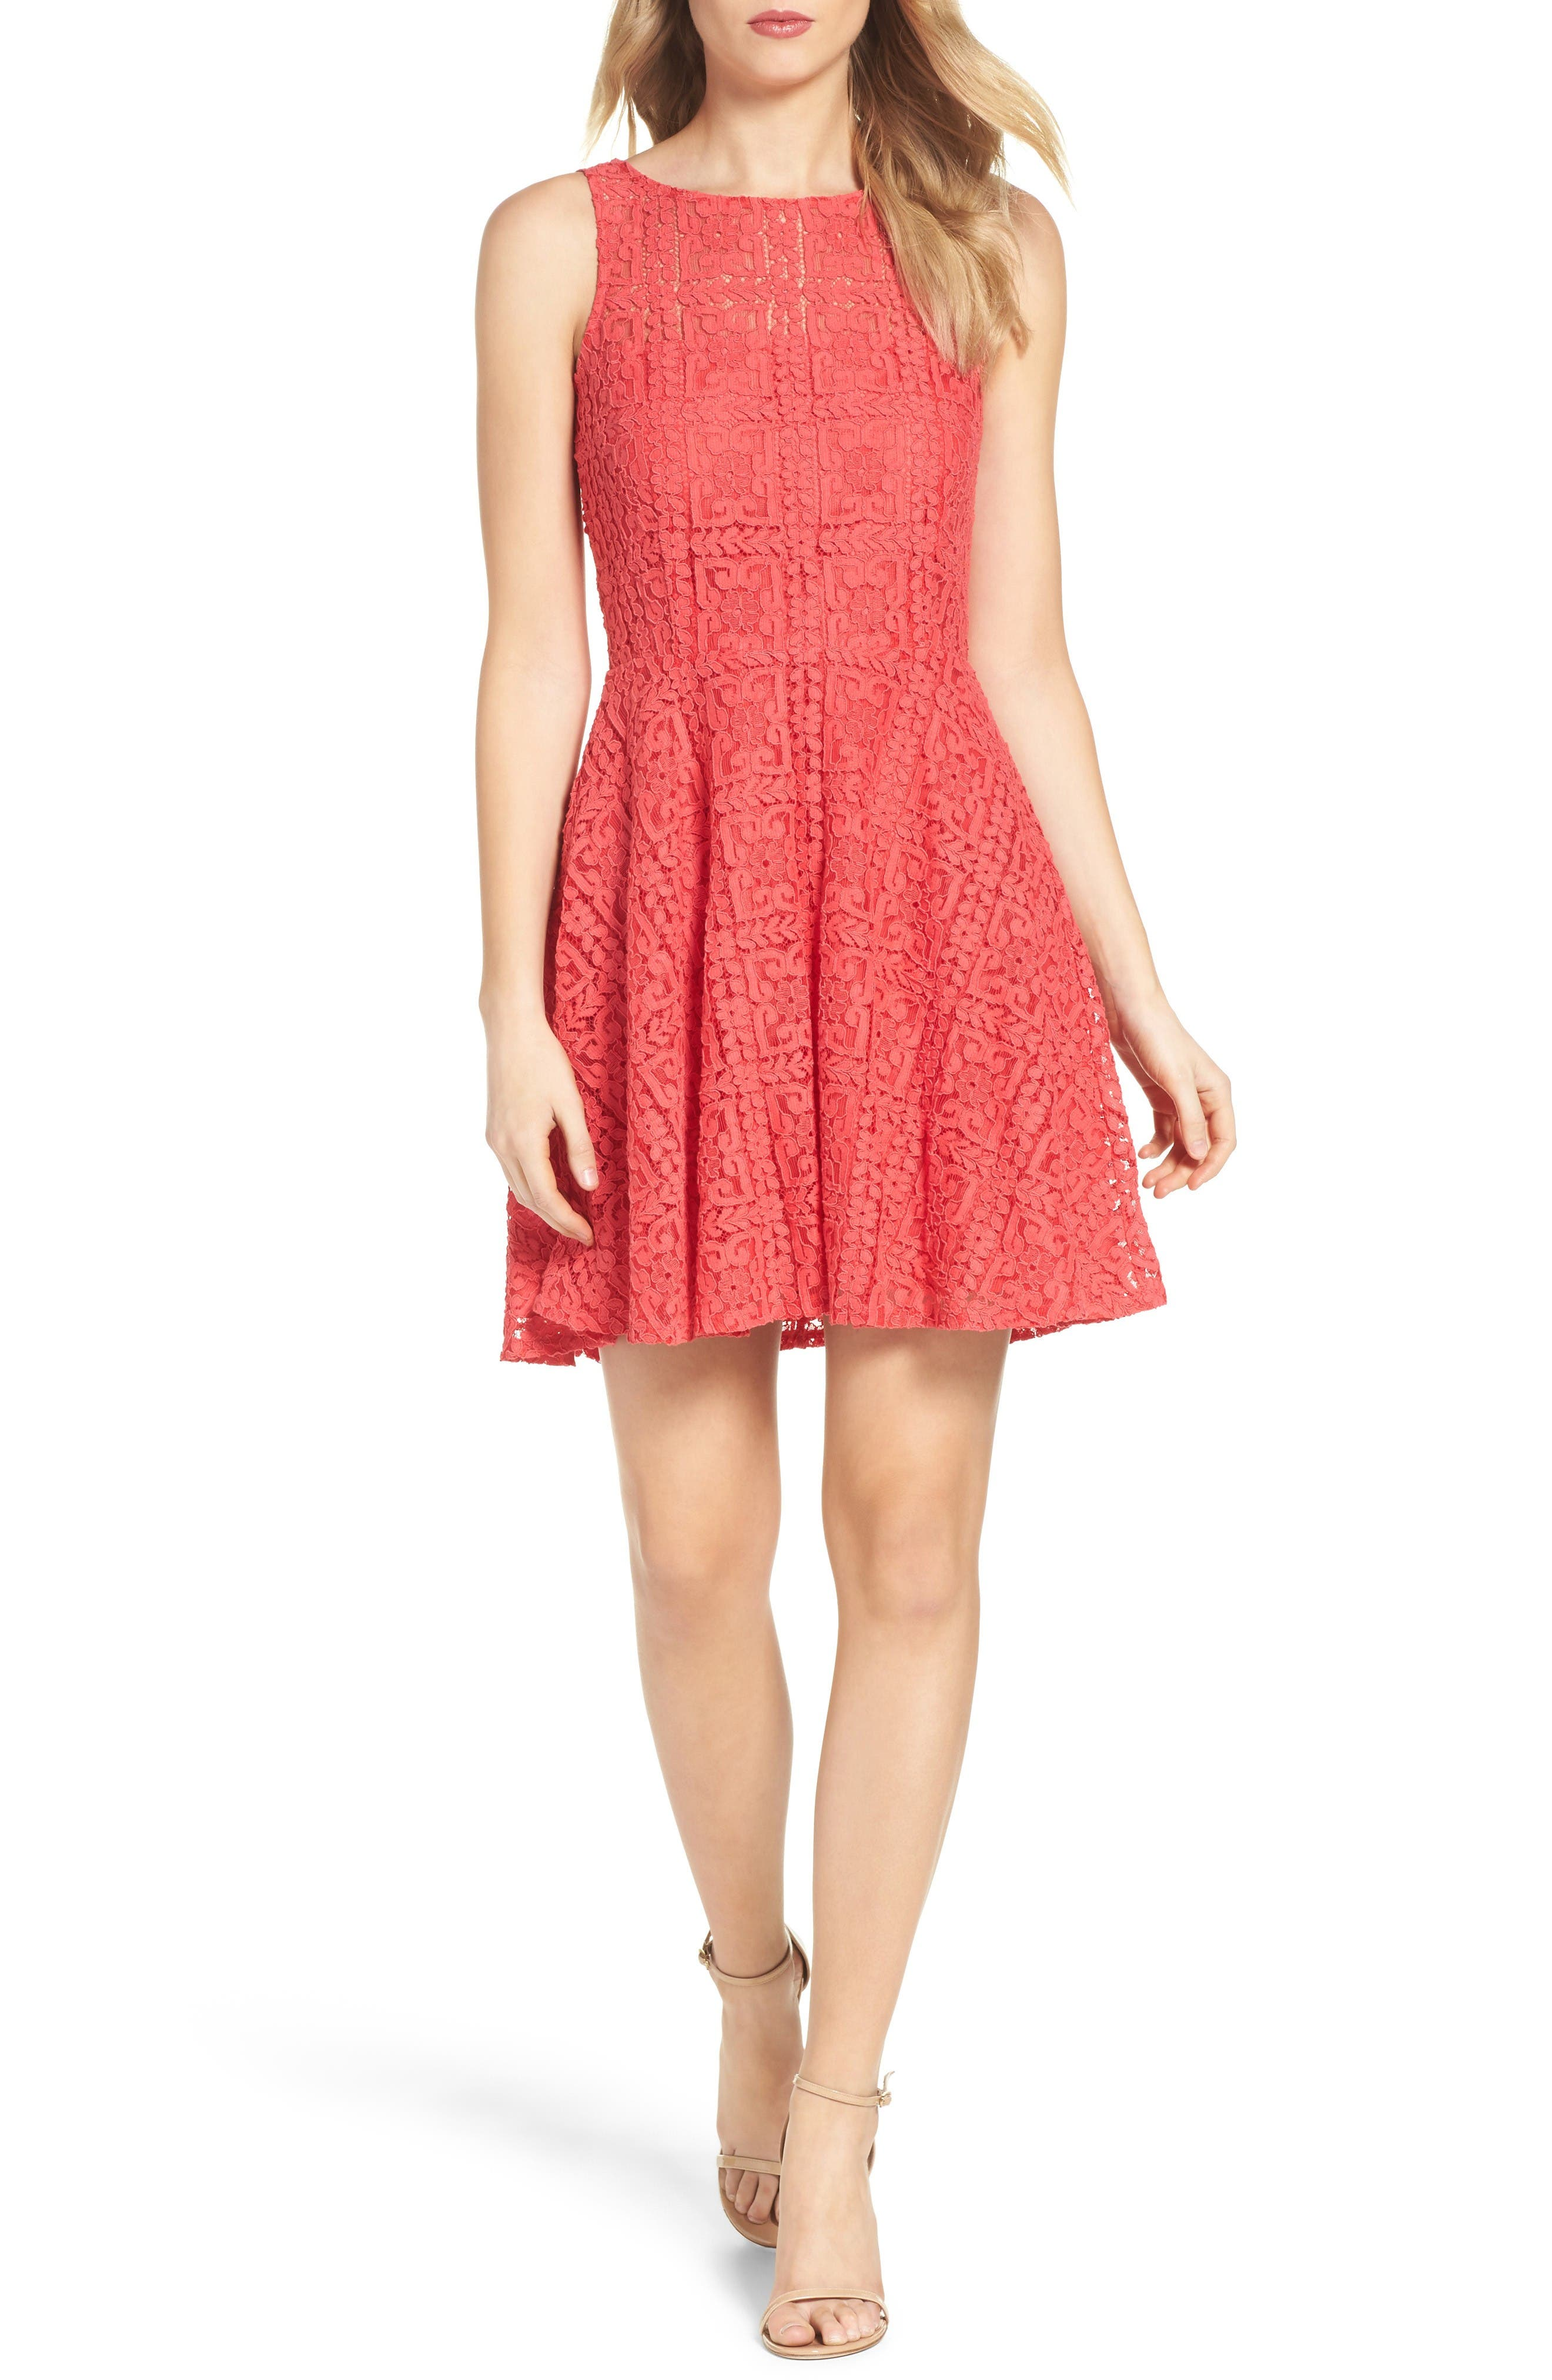 Alternate Image 1 Selected - BB Dakota Paloma Lace Fit & Flare Dress